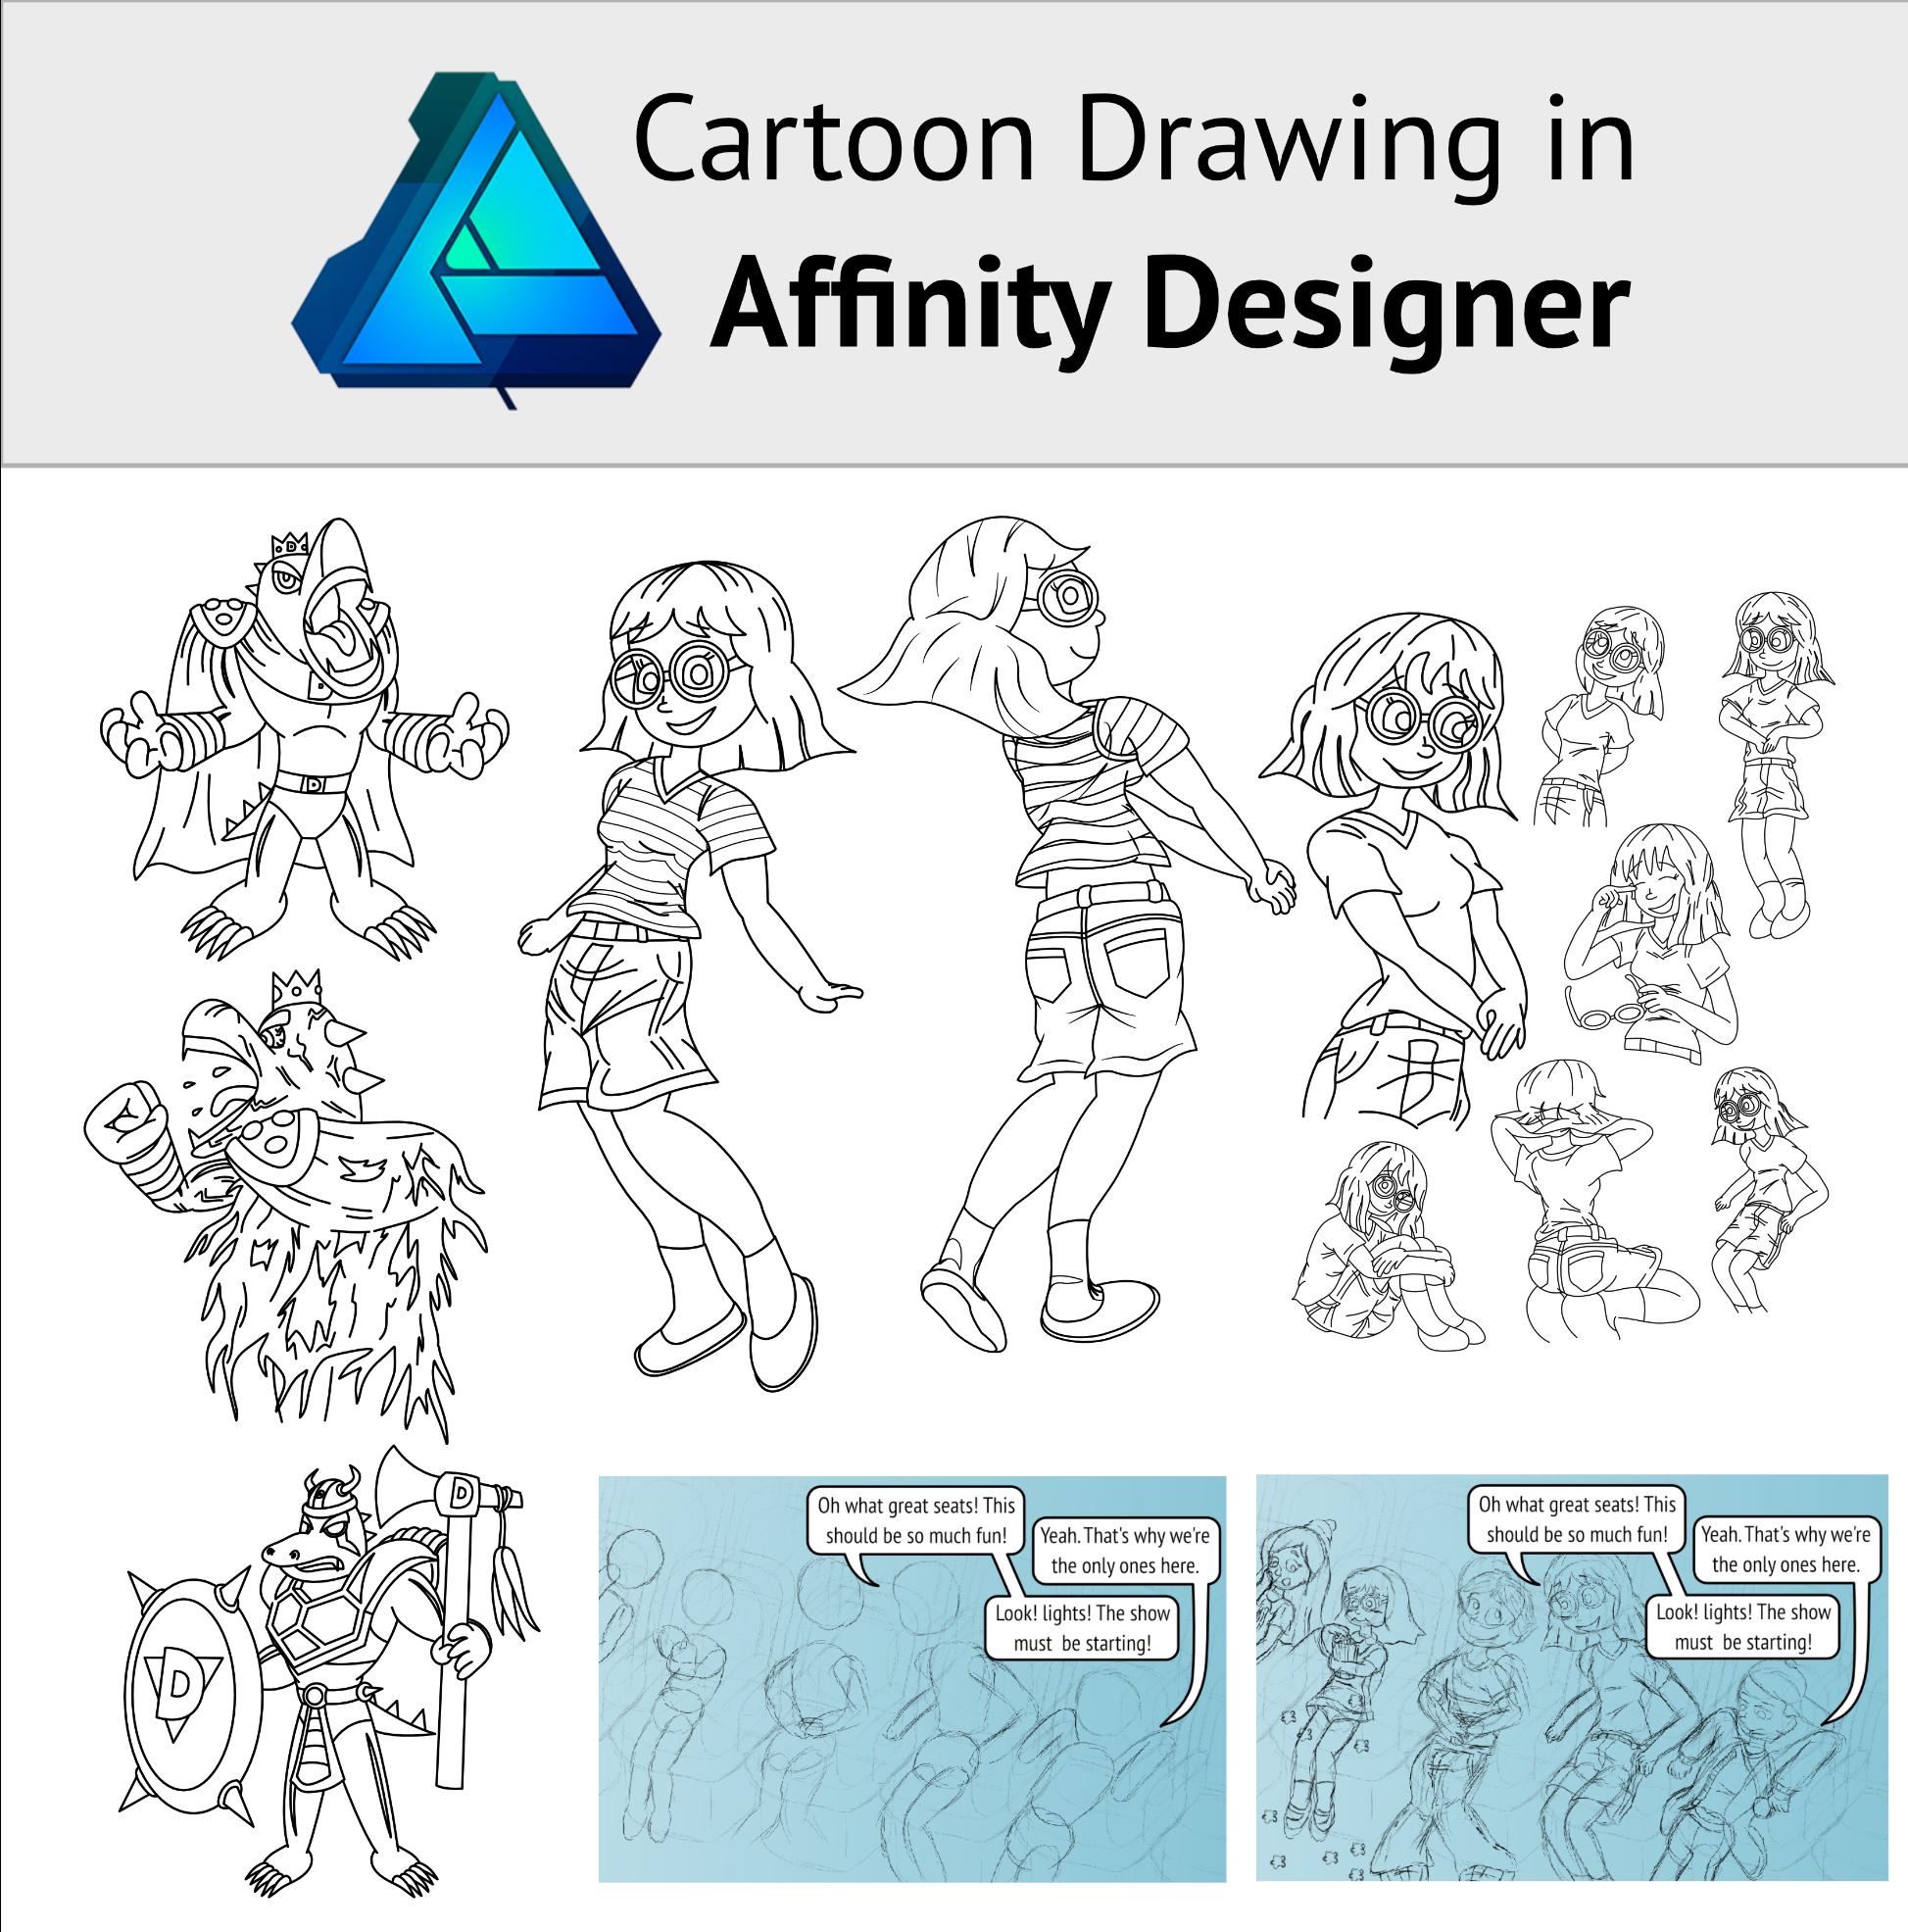 Cartoon Drawing in Affinity Designer - Tutorials (Serif and